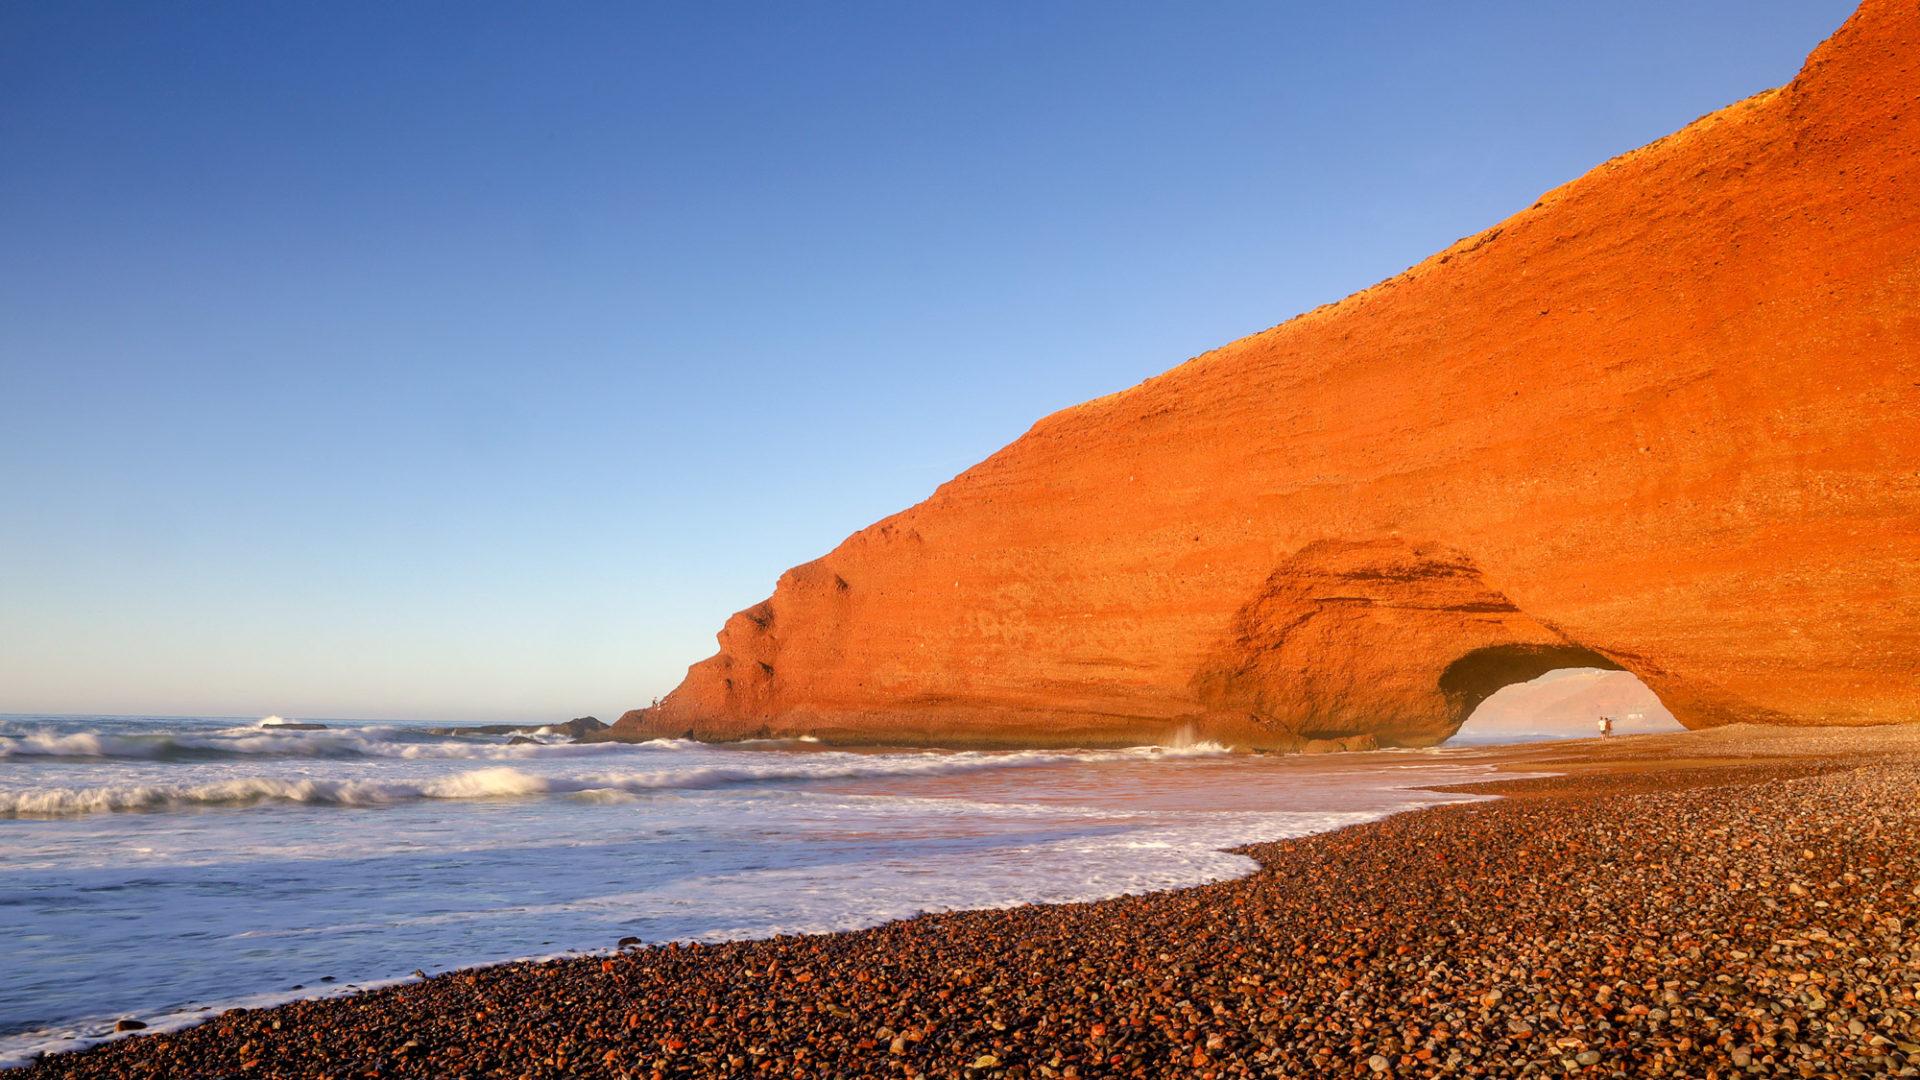 Felsentor am Legzira Beach bei Sonnenuntergang, Atlantikküste Marokko